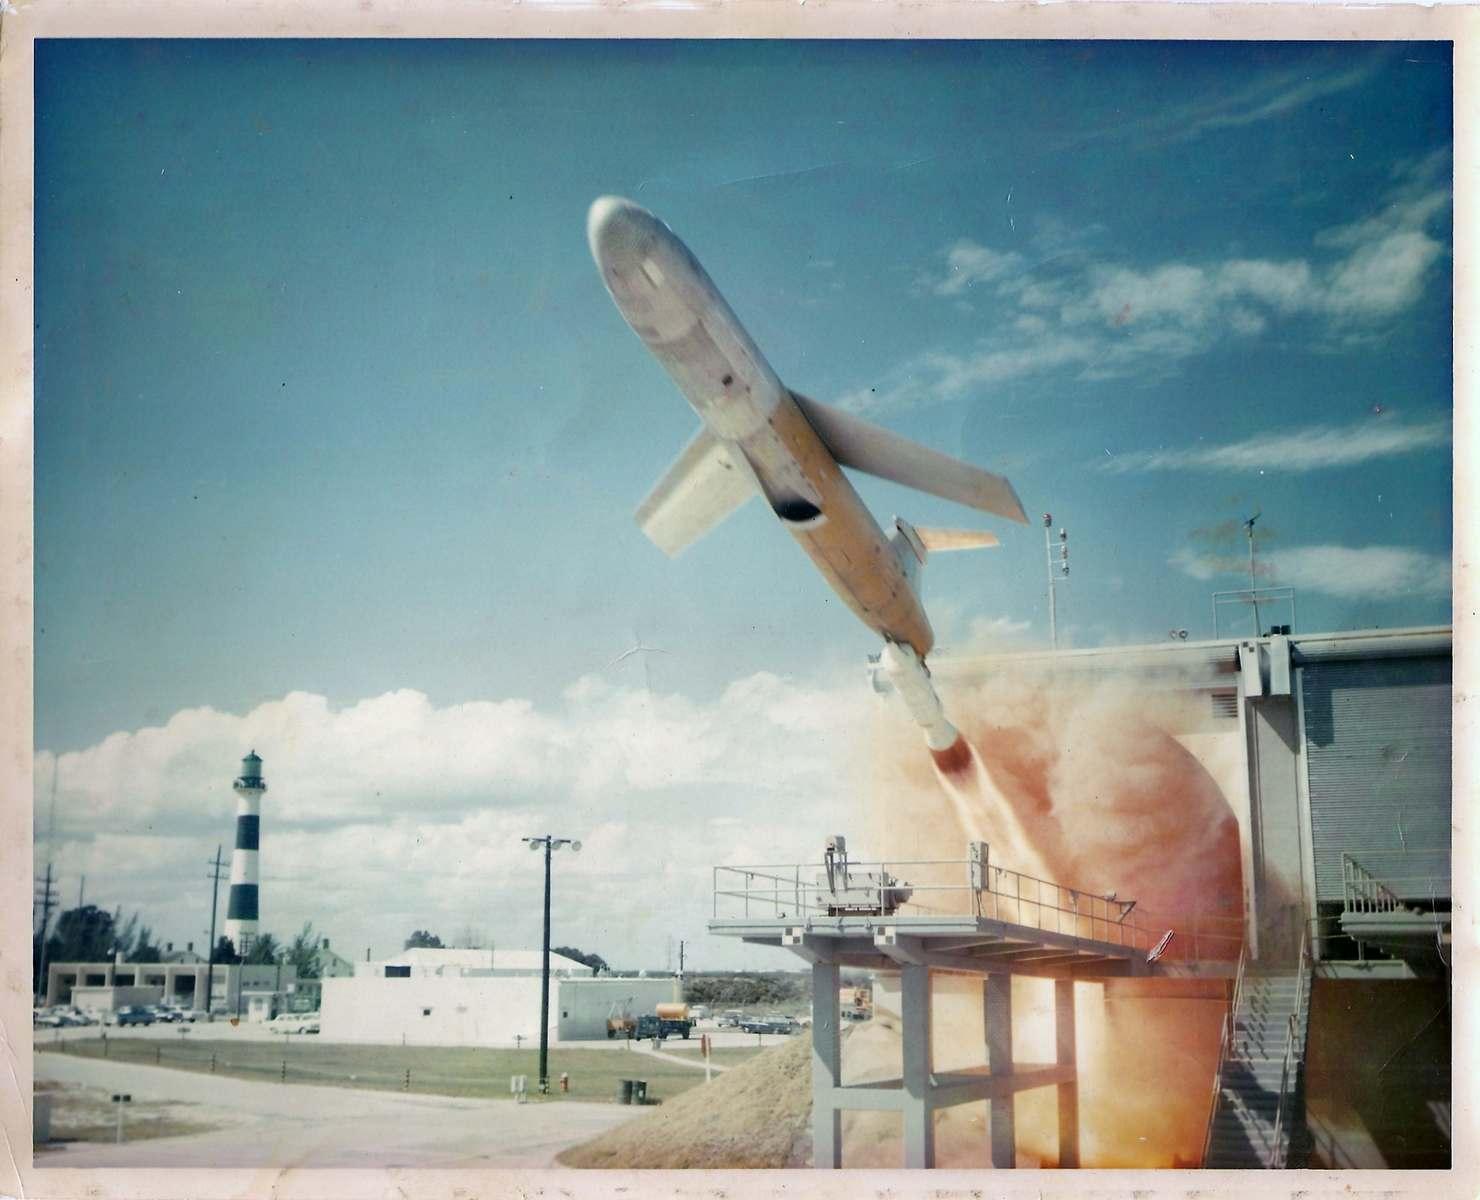 Mace B Test Launch